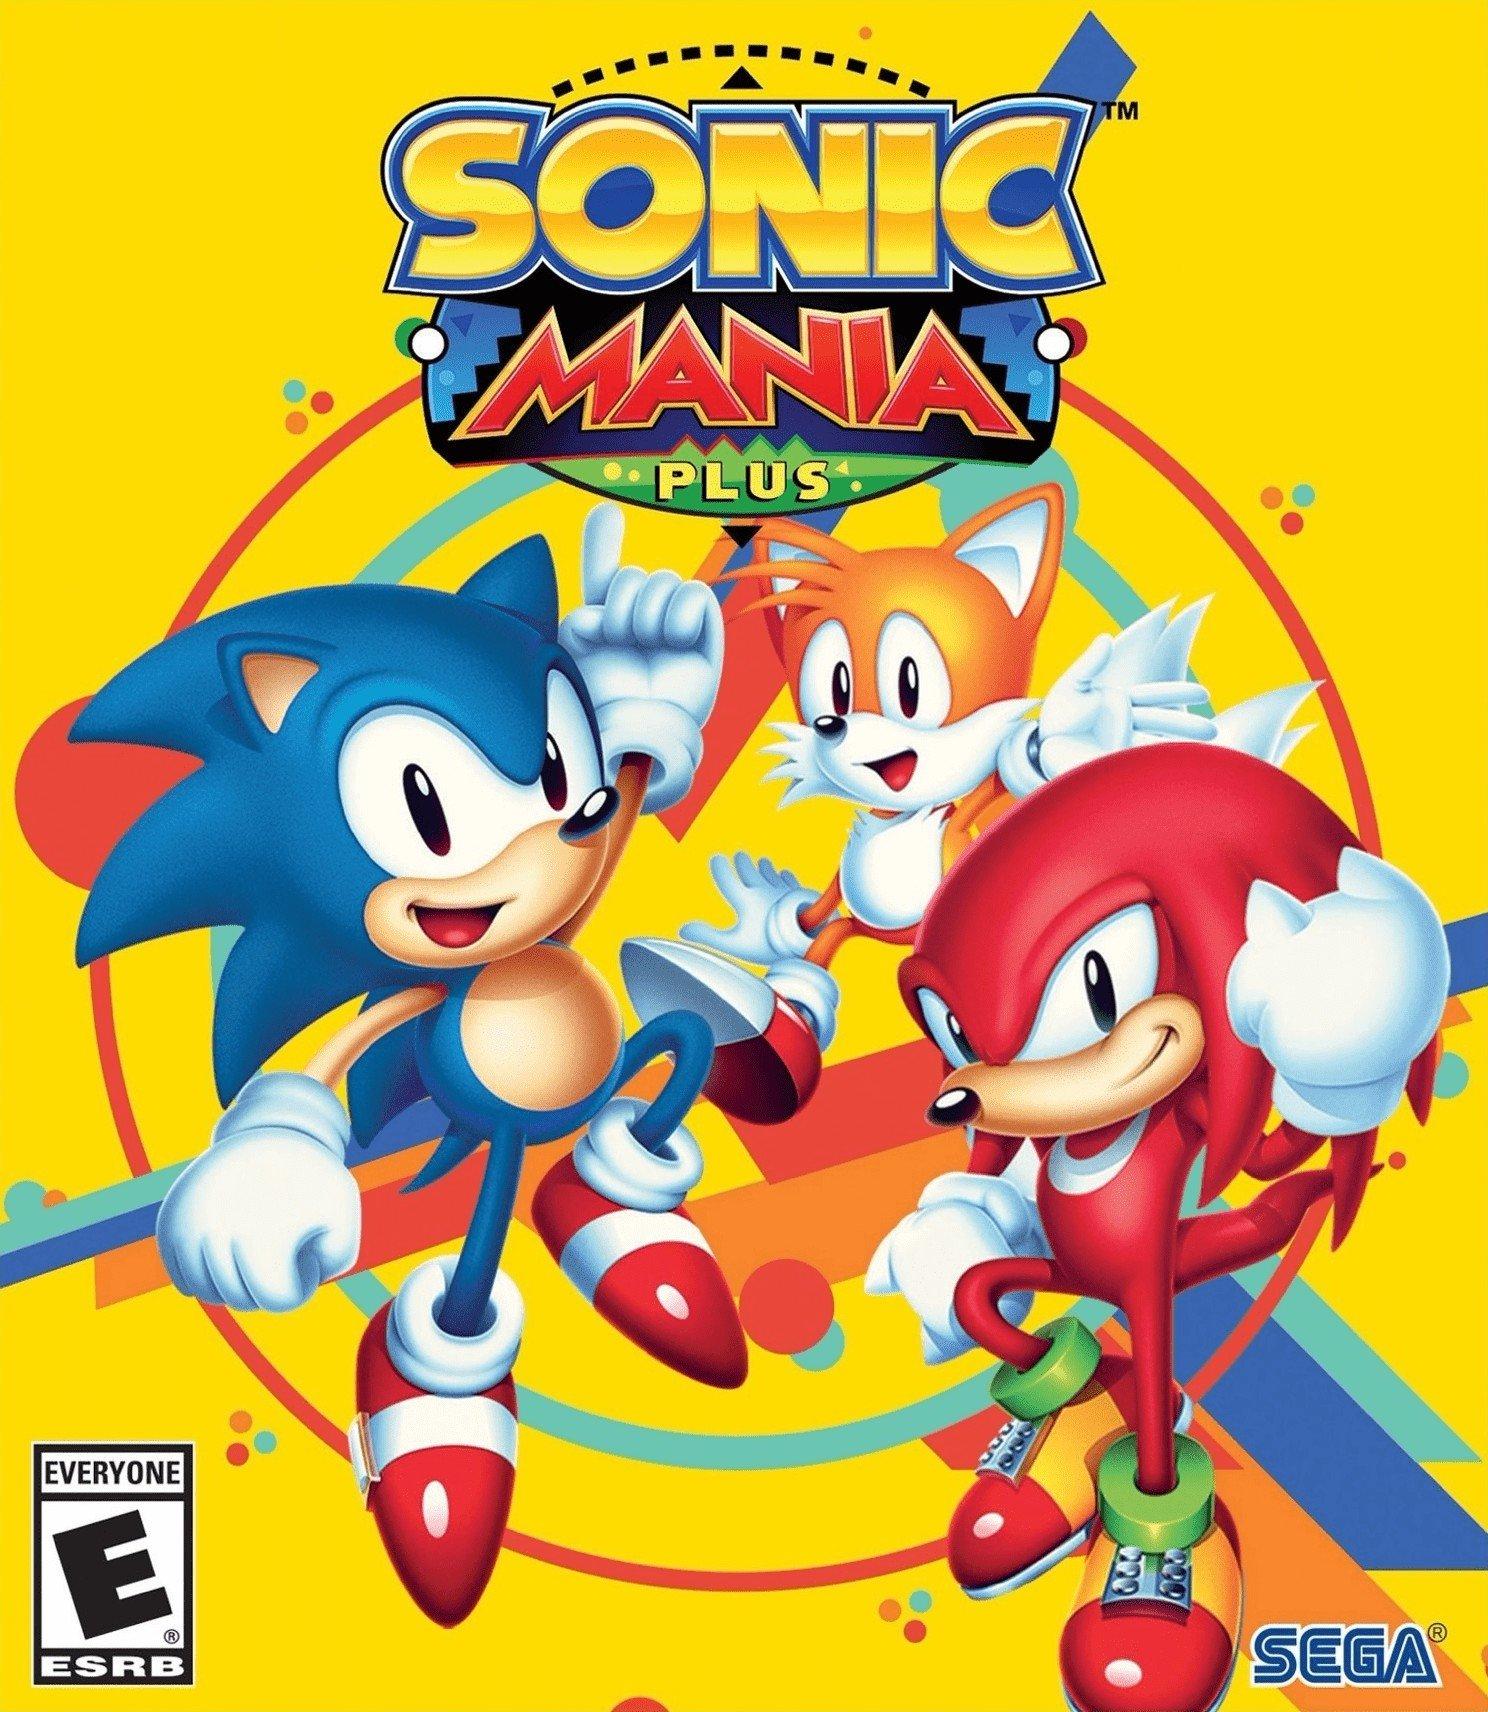 Sonic Mania Plus (Nintendo Switch) Review 4